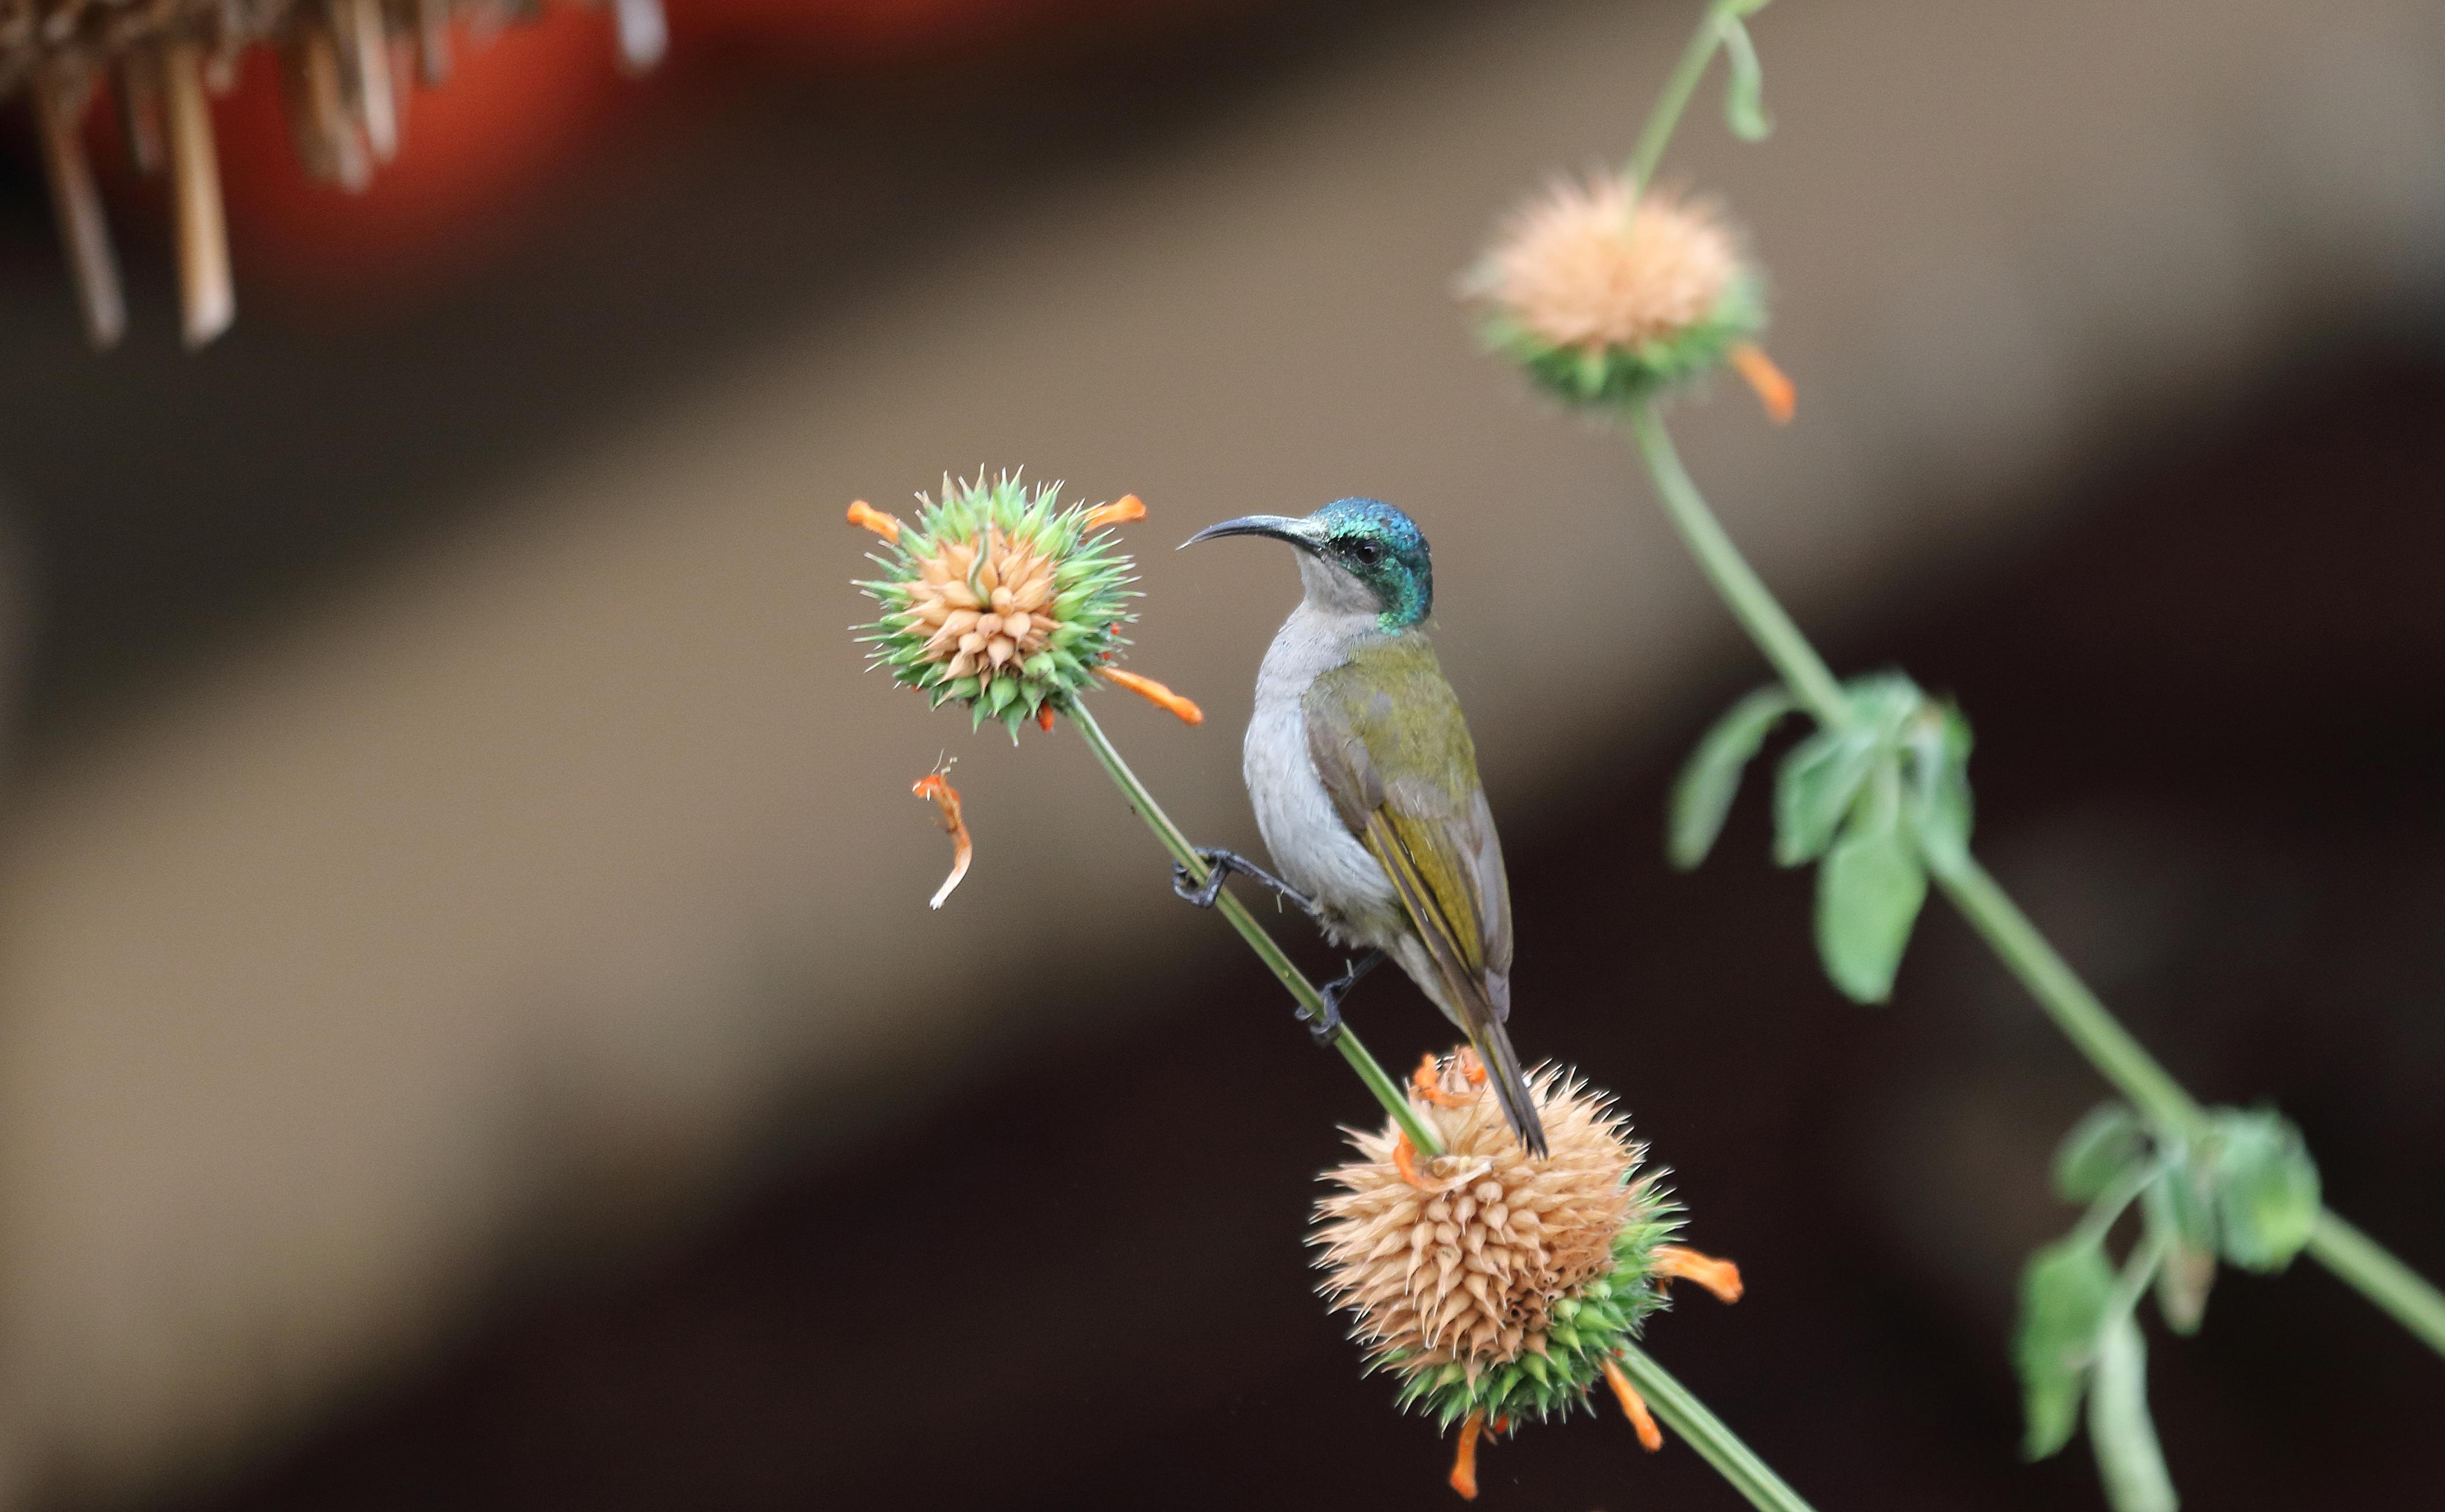 Green-headed Sunbird